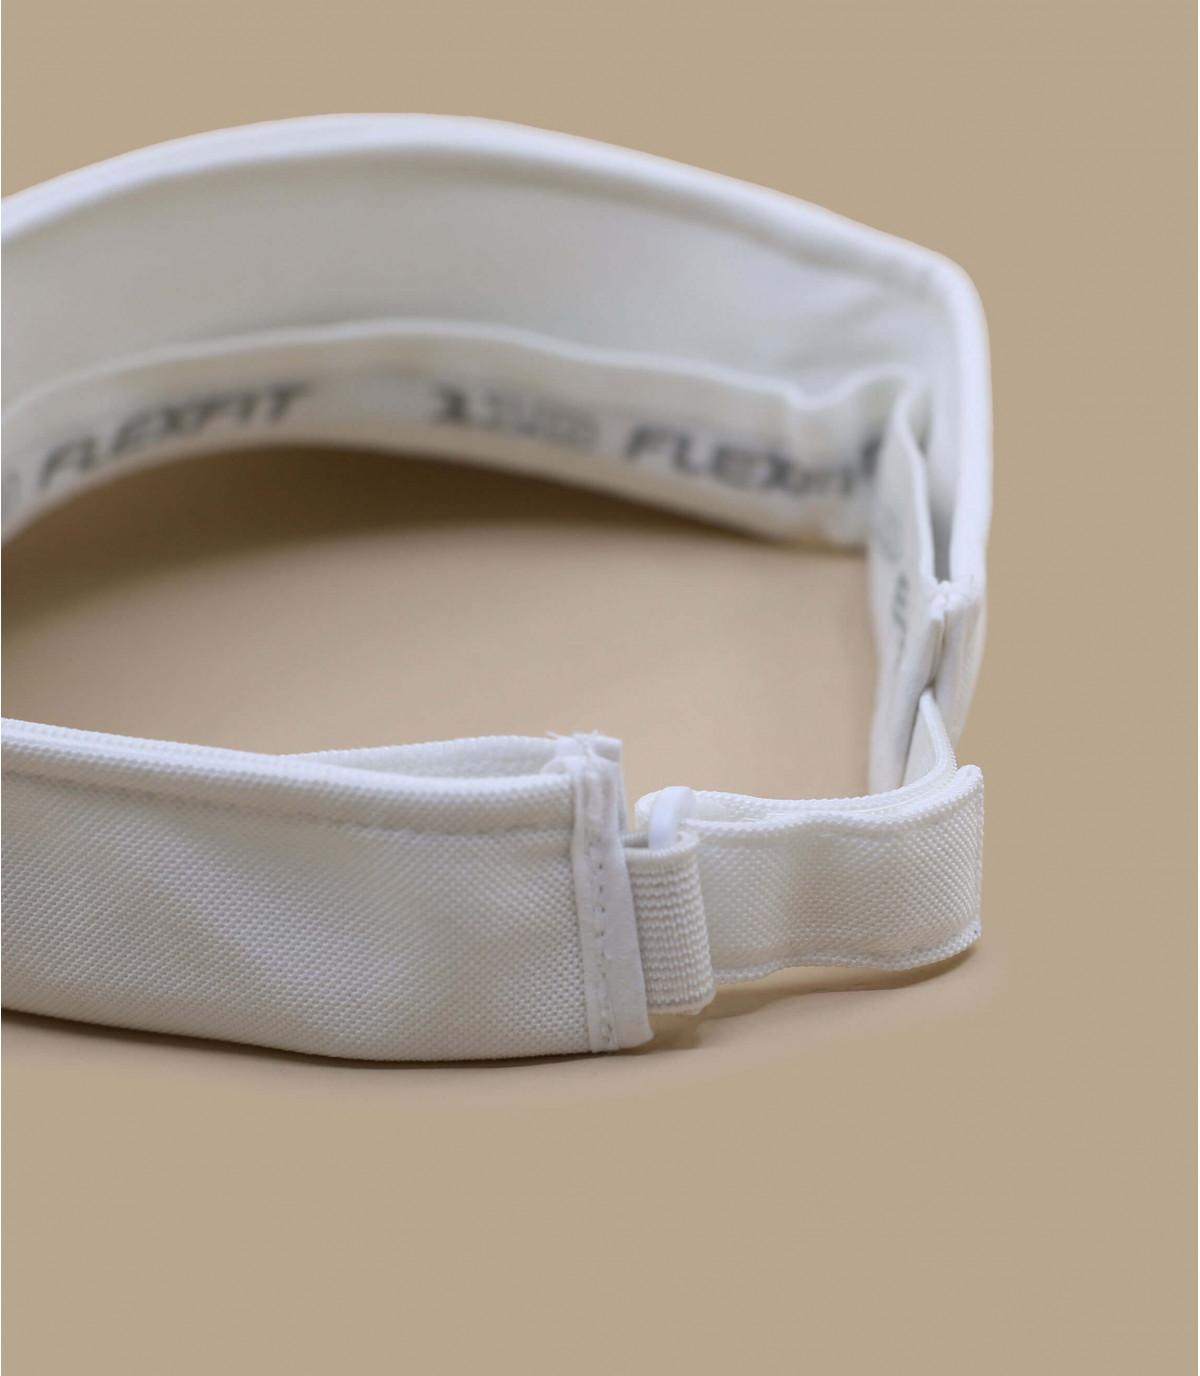 Détails White visor - image 3